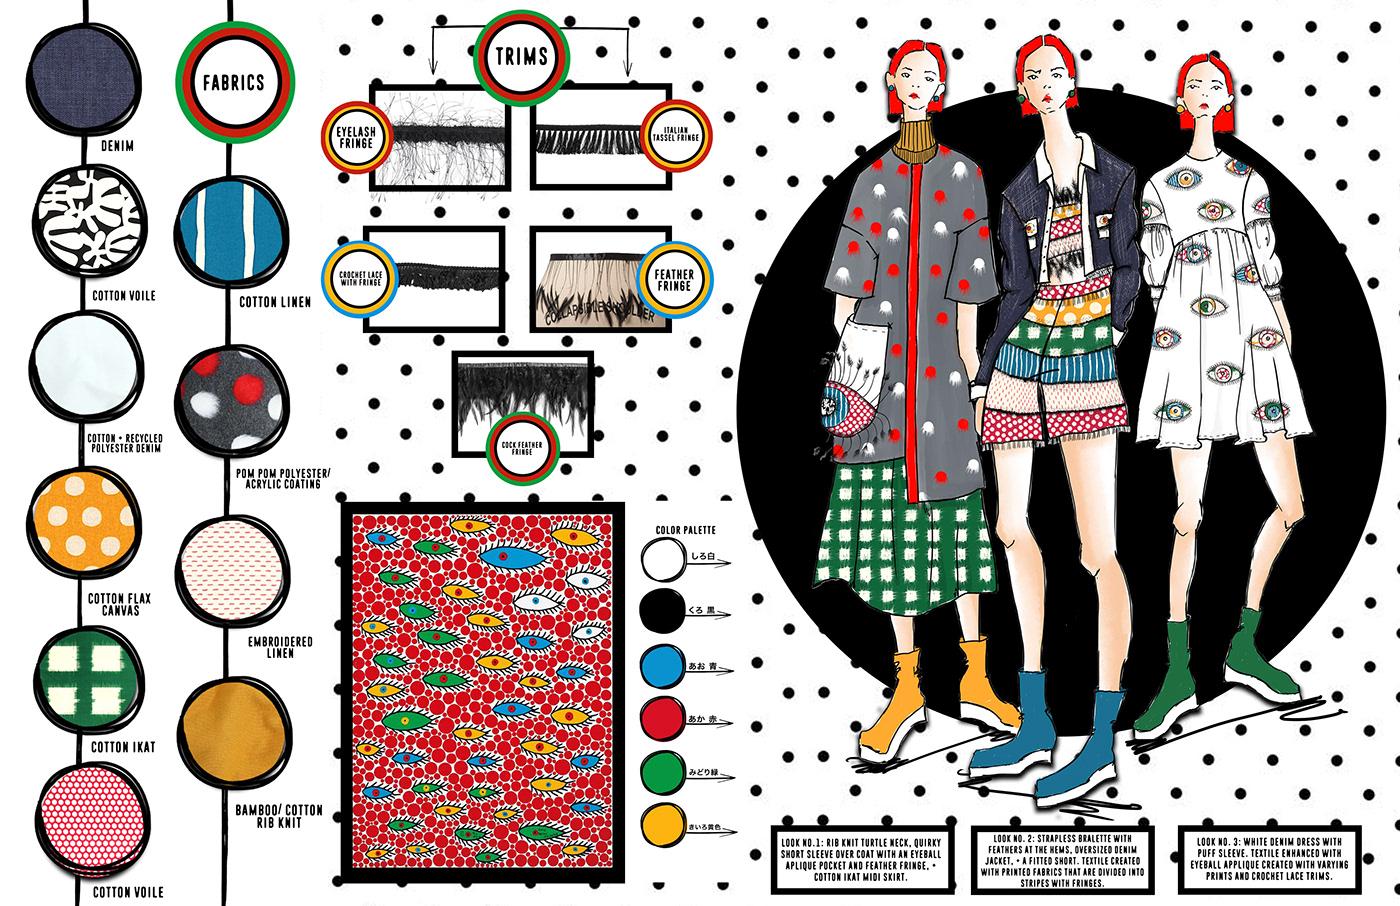 Adobe Photoshop color story concept development fabrication fashion design fashion illustration iterations kusama unconventional